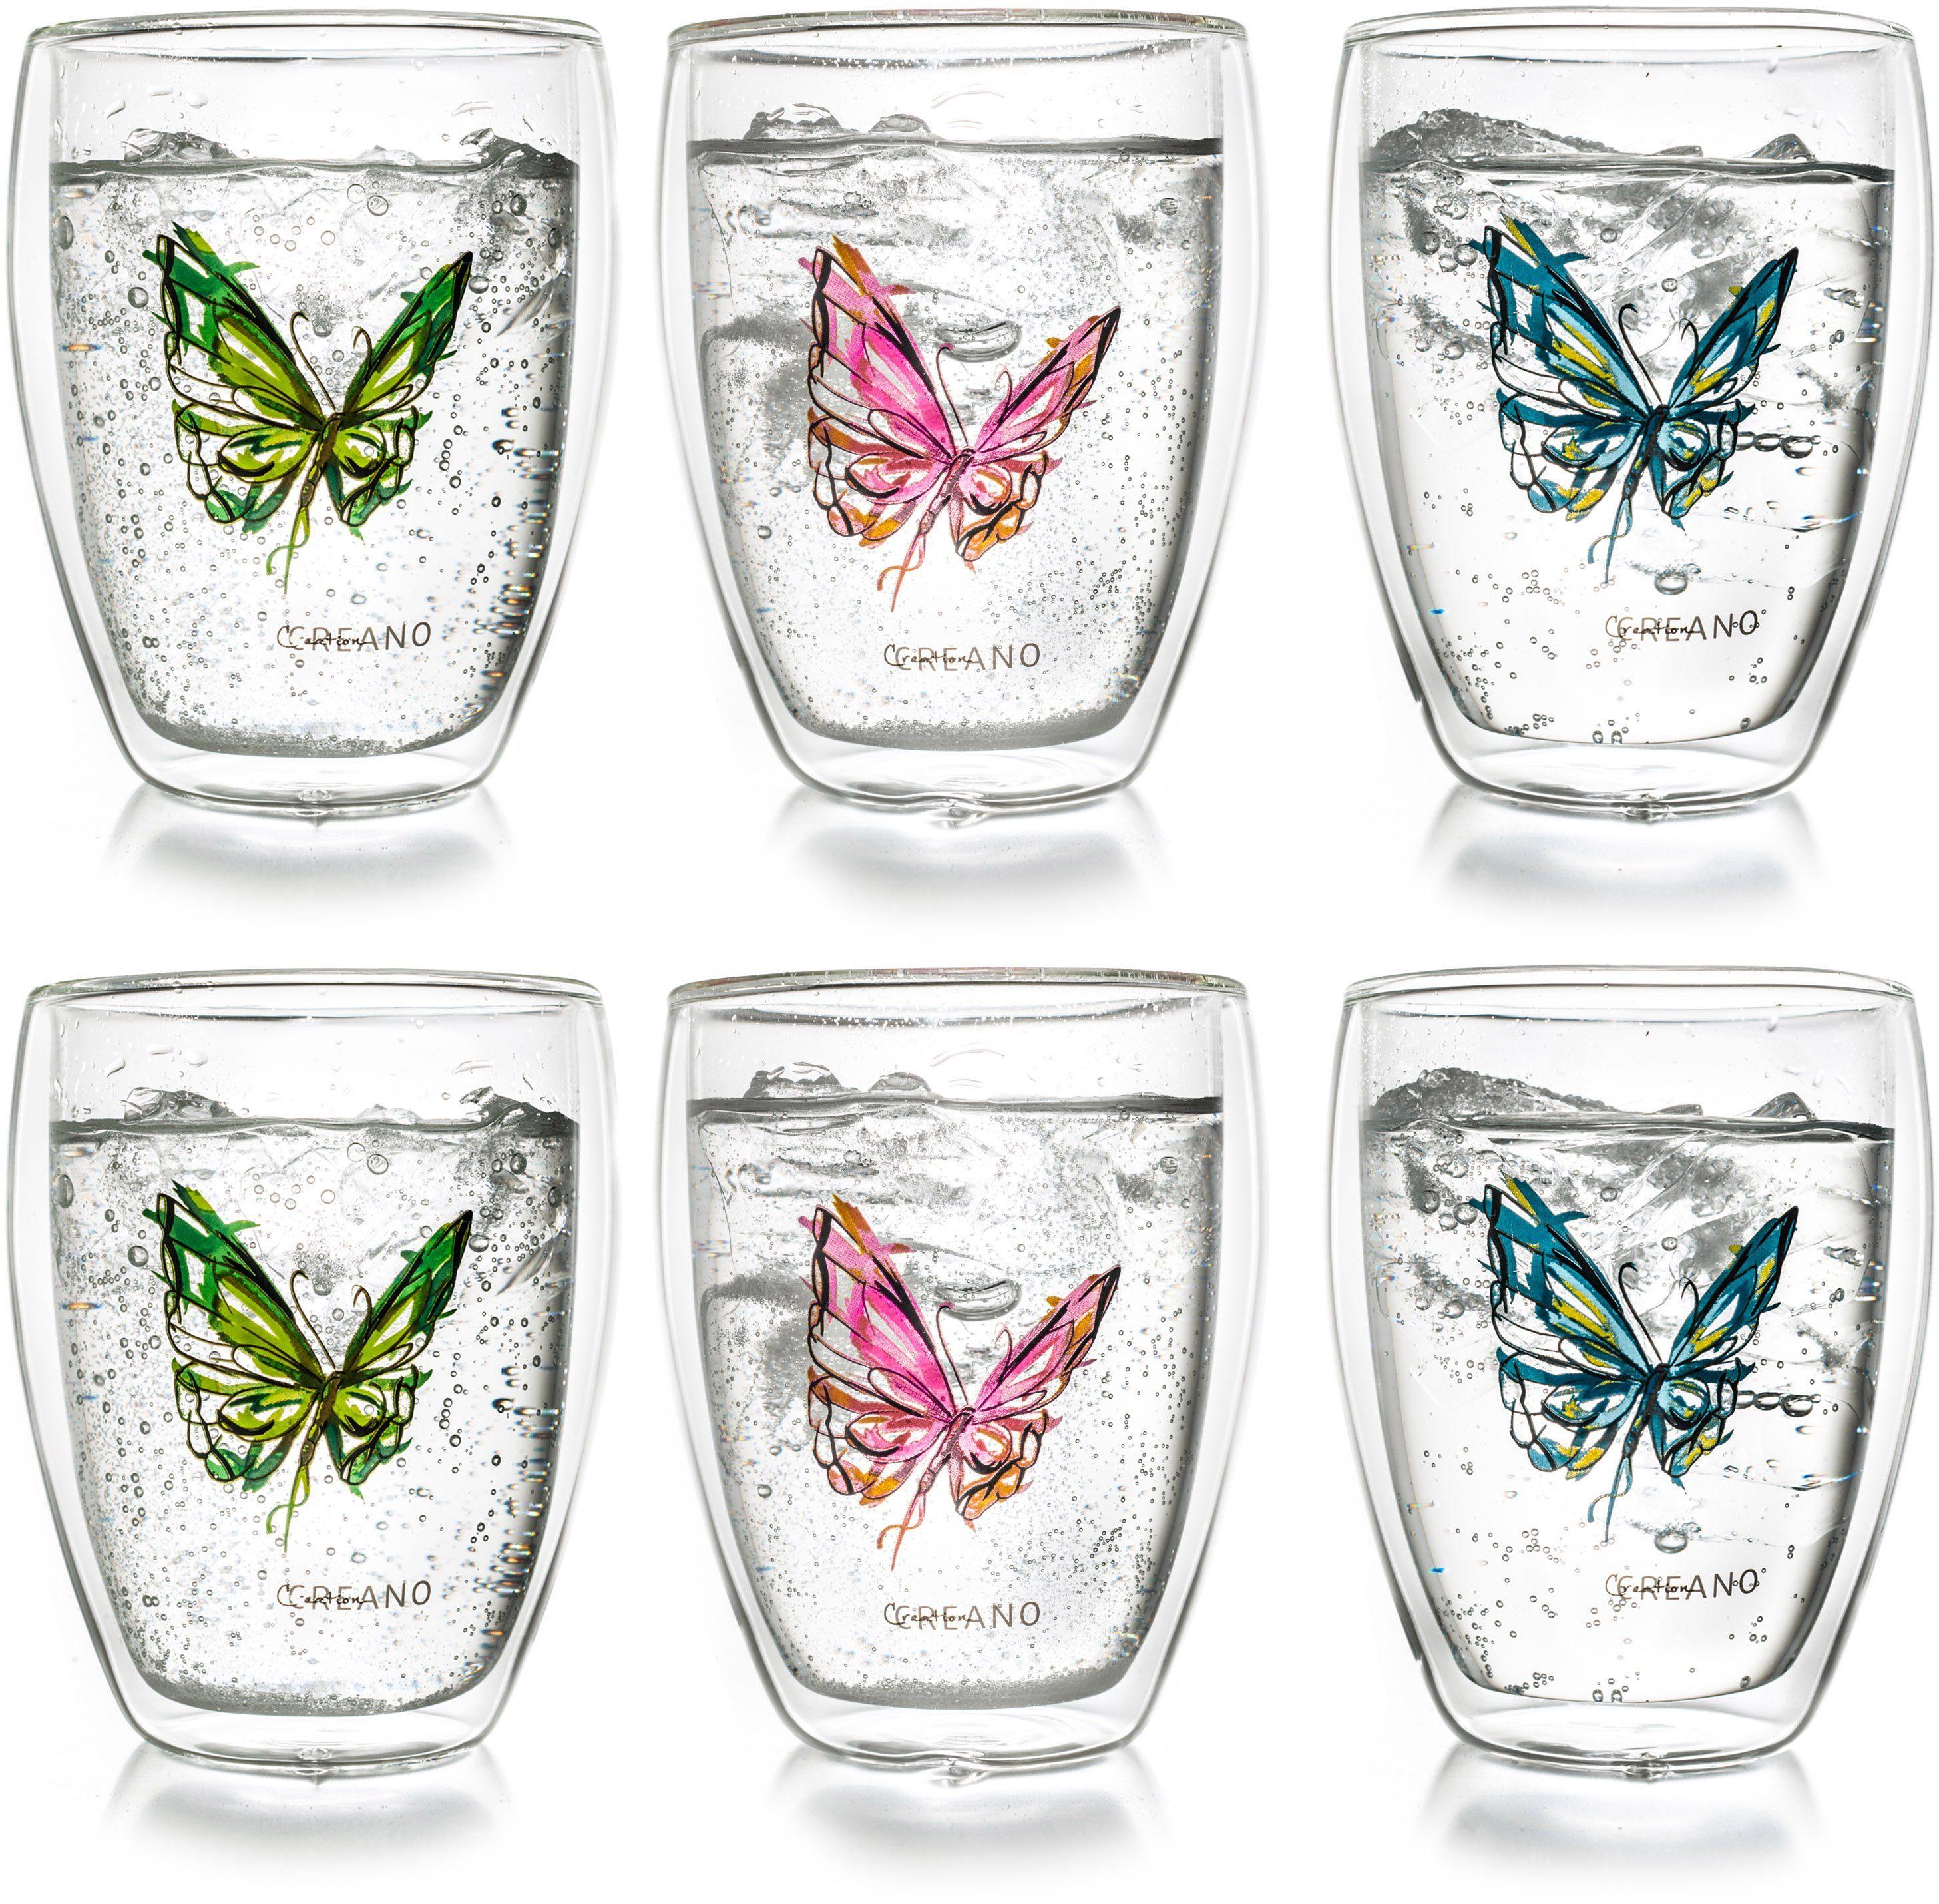 Creano Thermo-Glas, 6-er Set, doppelwandiges Tee-Glas, Latte Macchiato Glas, »Colourfly«